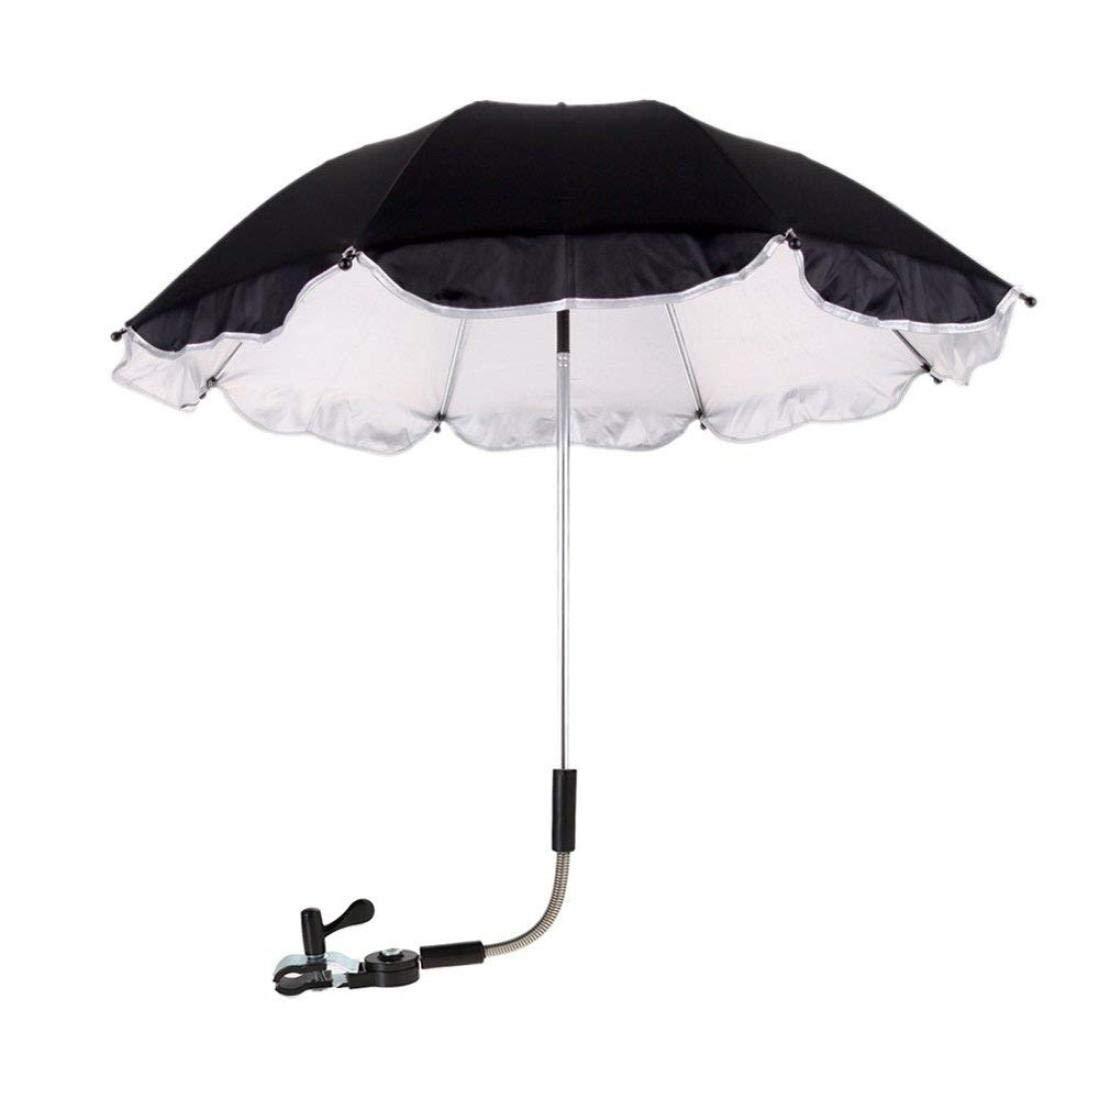 Hatoys Stroller Weather Shield Stroller Cover Parasol for Sun Rain Protection UV Rays Outdoor Umbrella (Black)